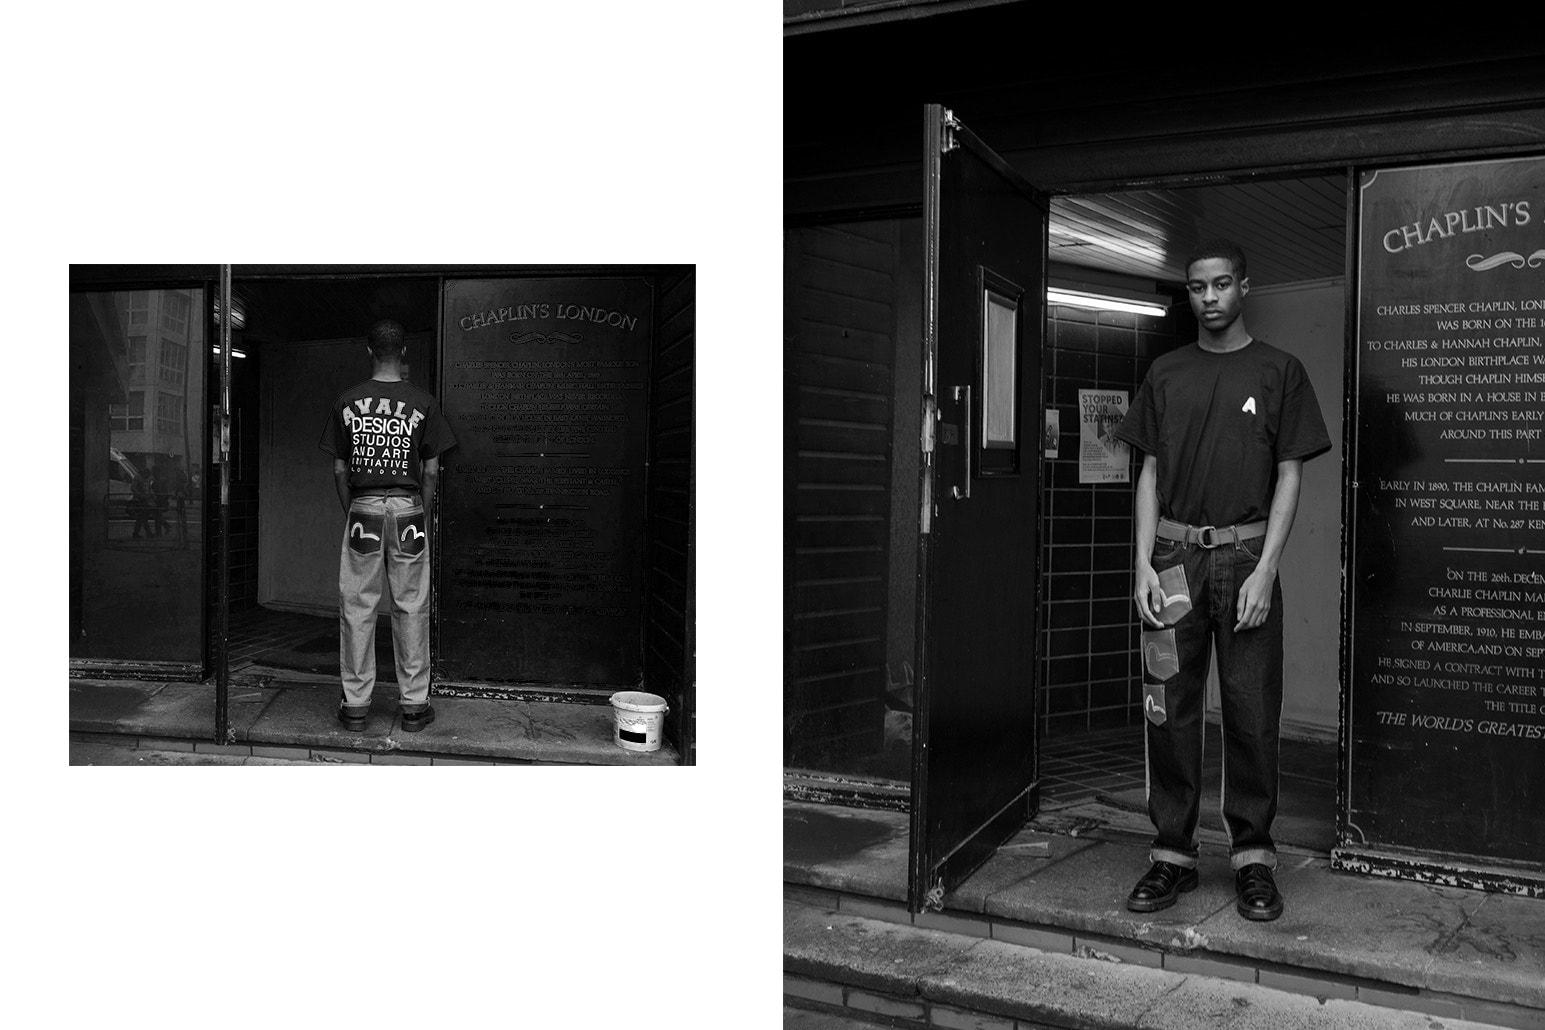 Best European Streetwear Releases Gosha Rubchinskiy Dover Street Market adidas Football Burberry Raf Simons New Balance 576 Grenson END. adidas Originals Marathon TR Epochal Nemeziz Predator Tango 18+ TR AVALE Studios MKI Not Applicable Selfridges Michele Lamy Lamyland